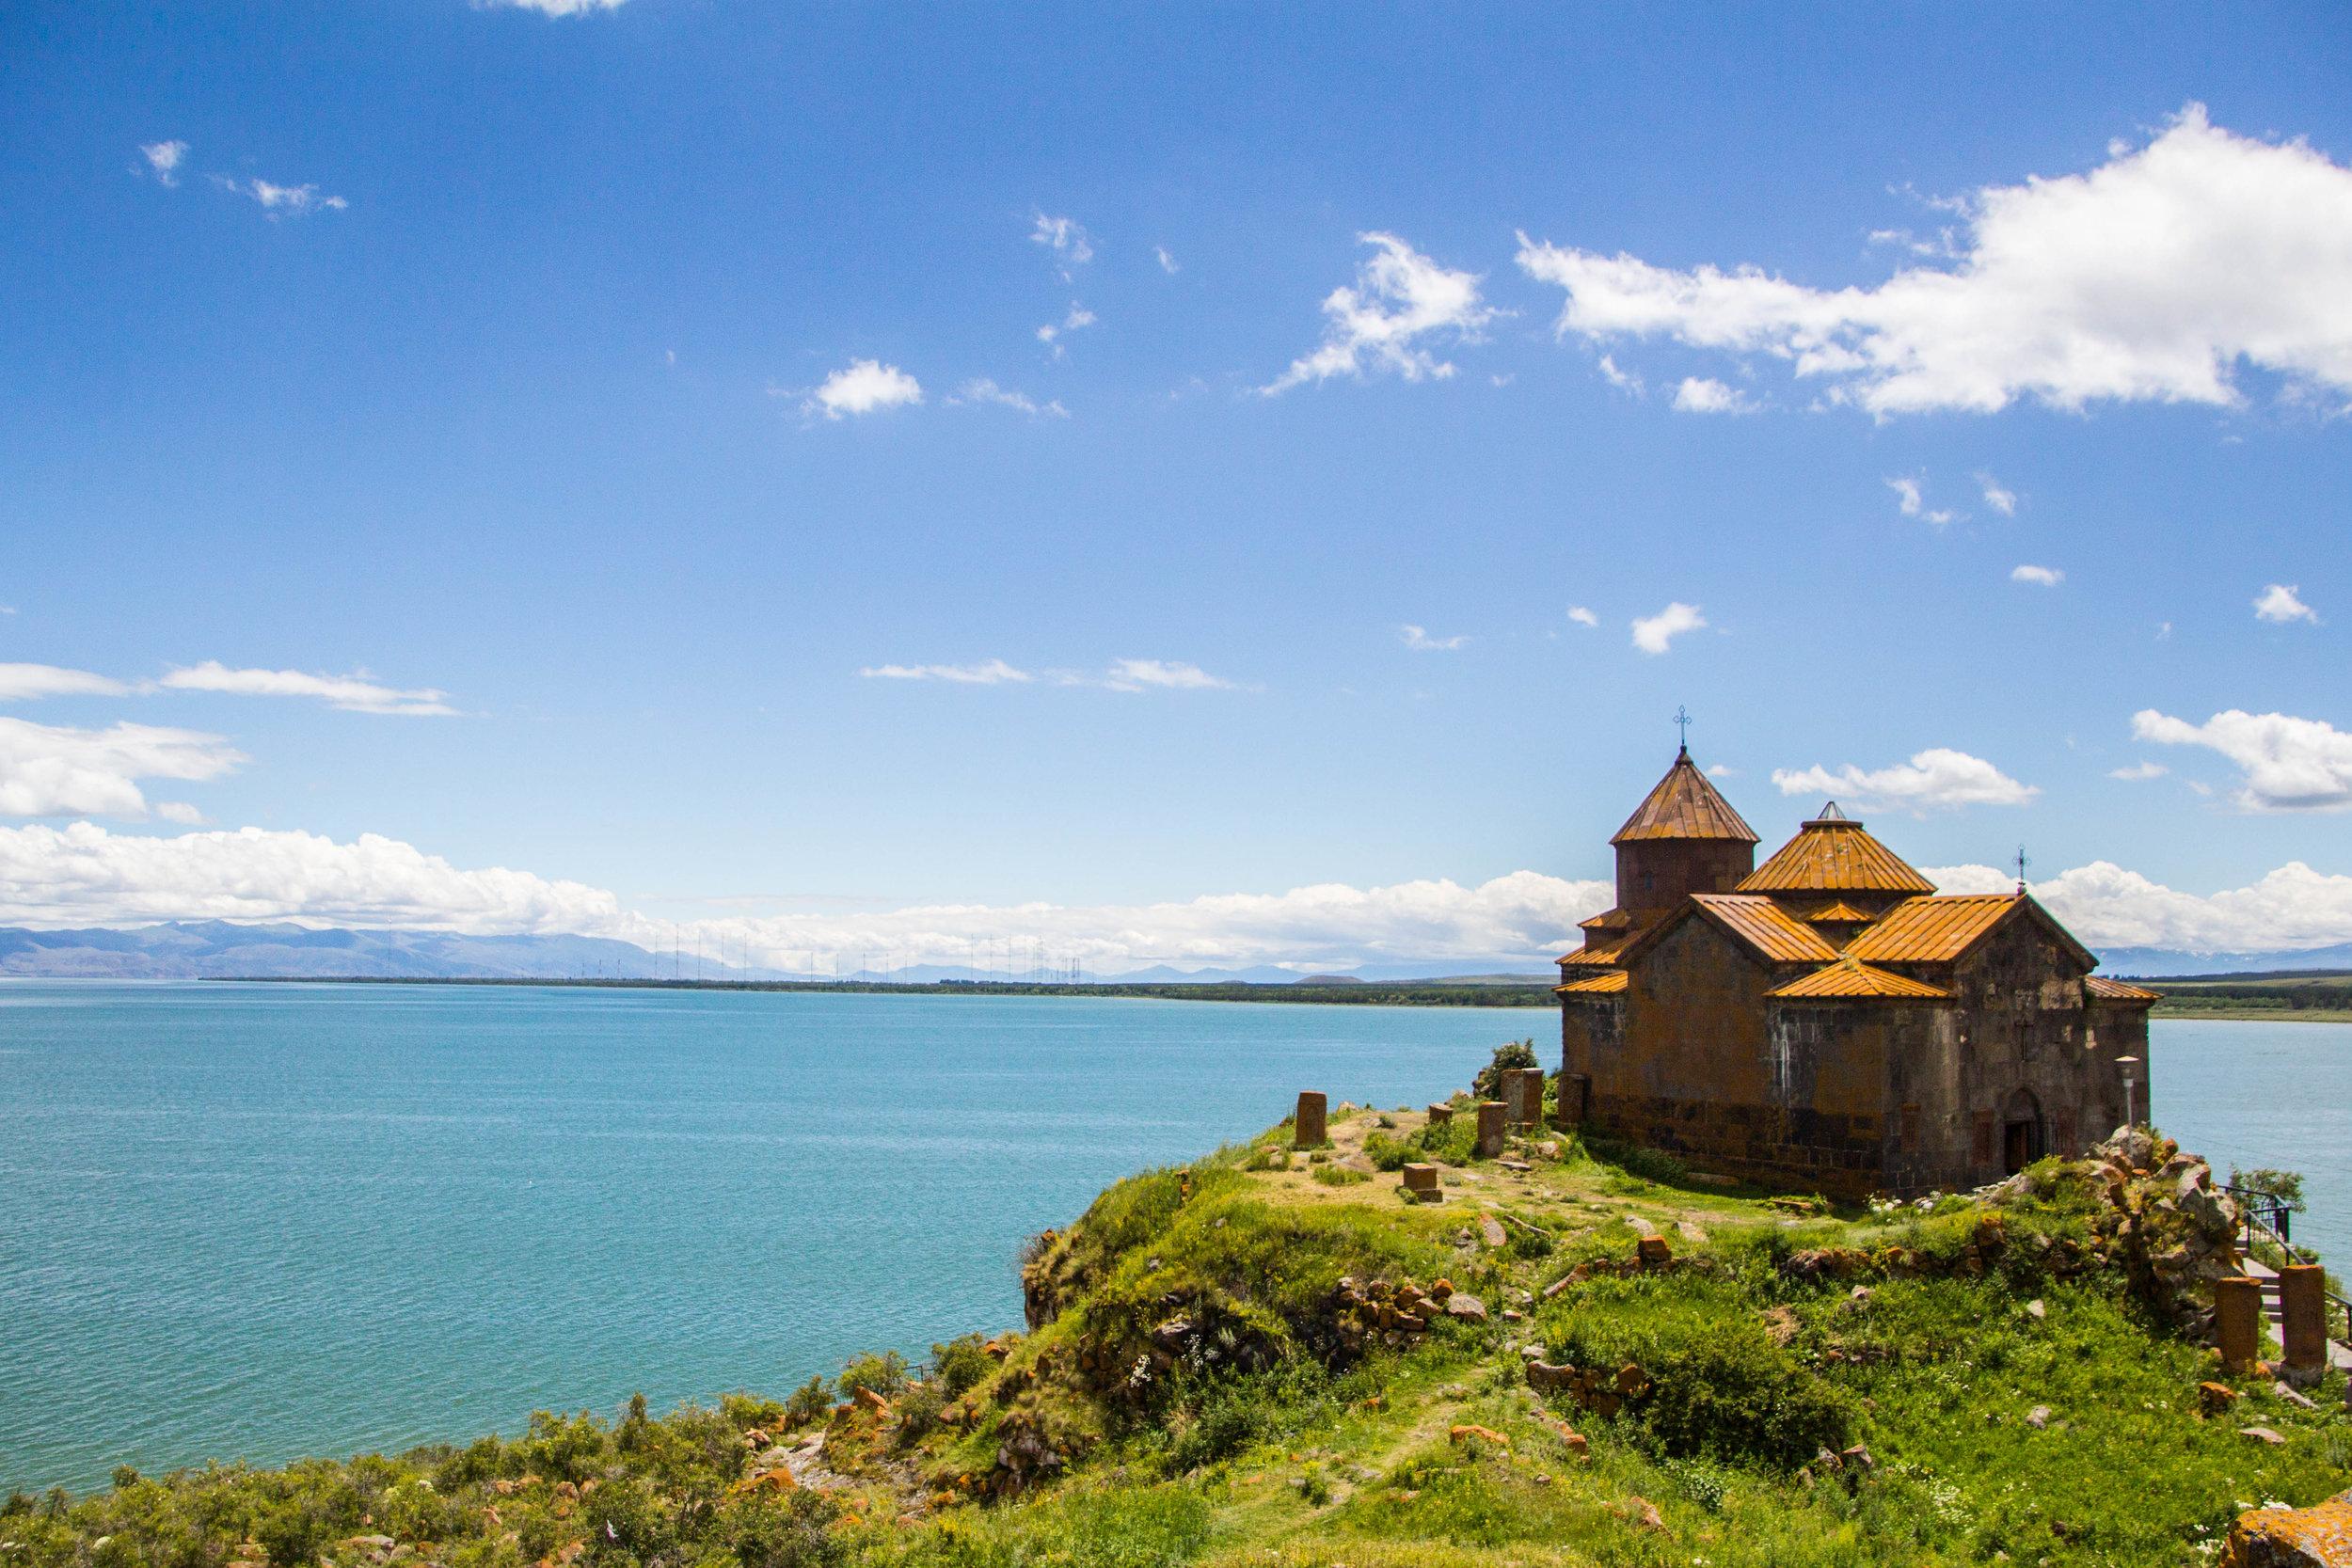 hayravank-lake-sevan-armenia-19.jpg